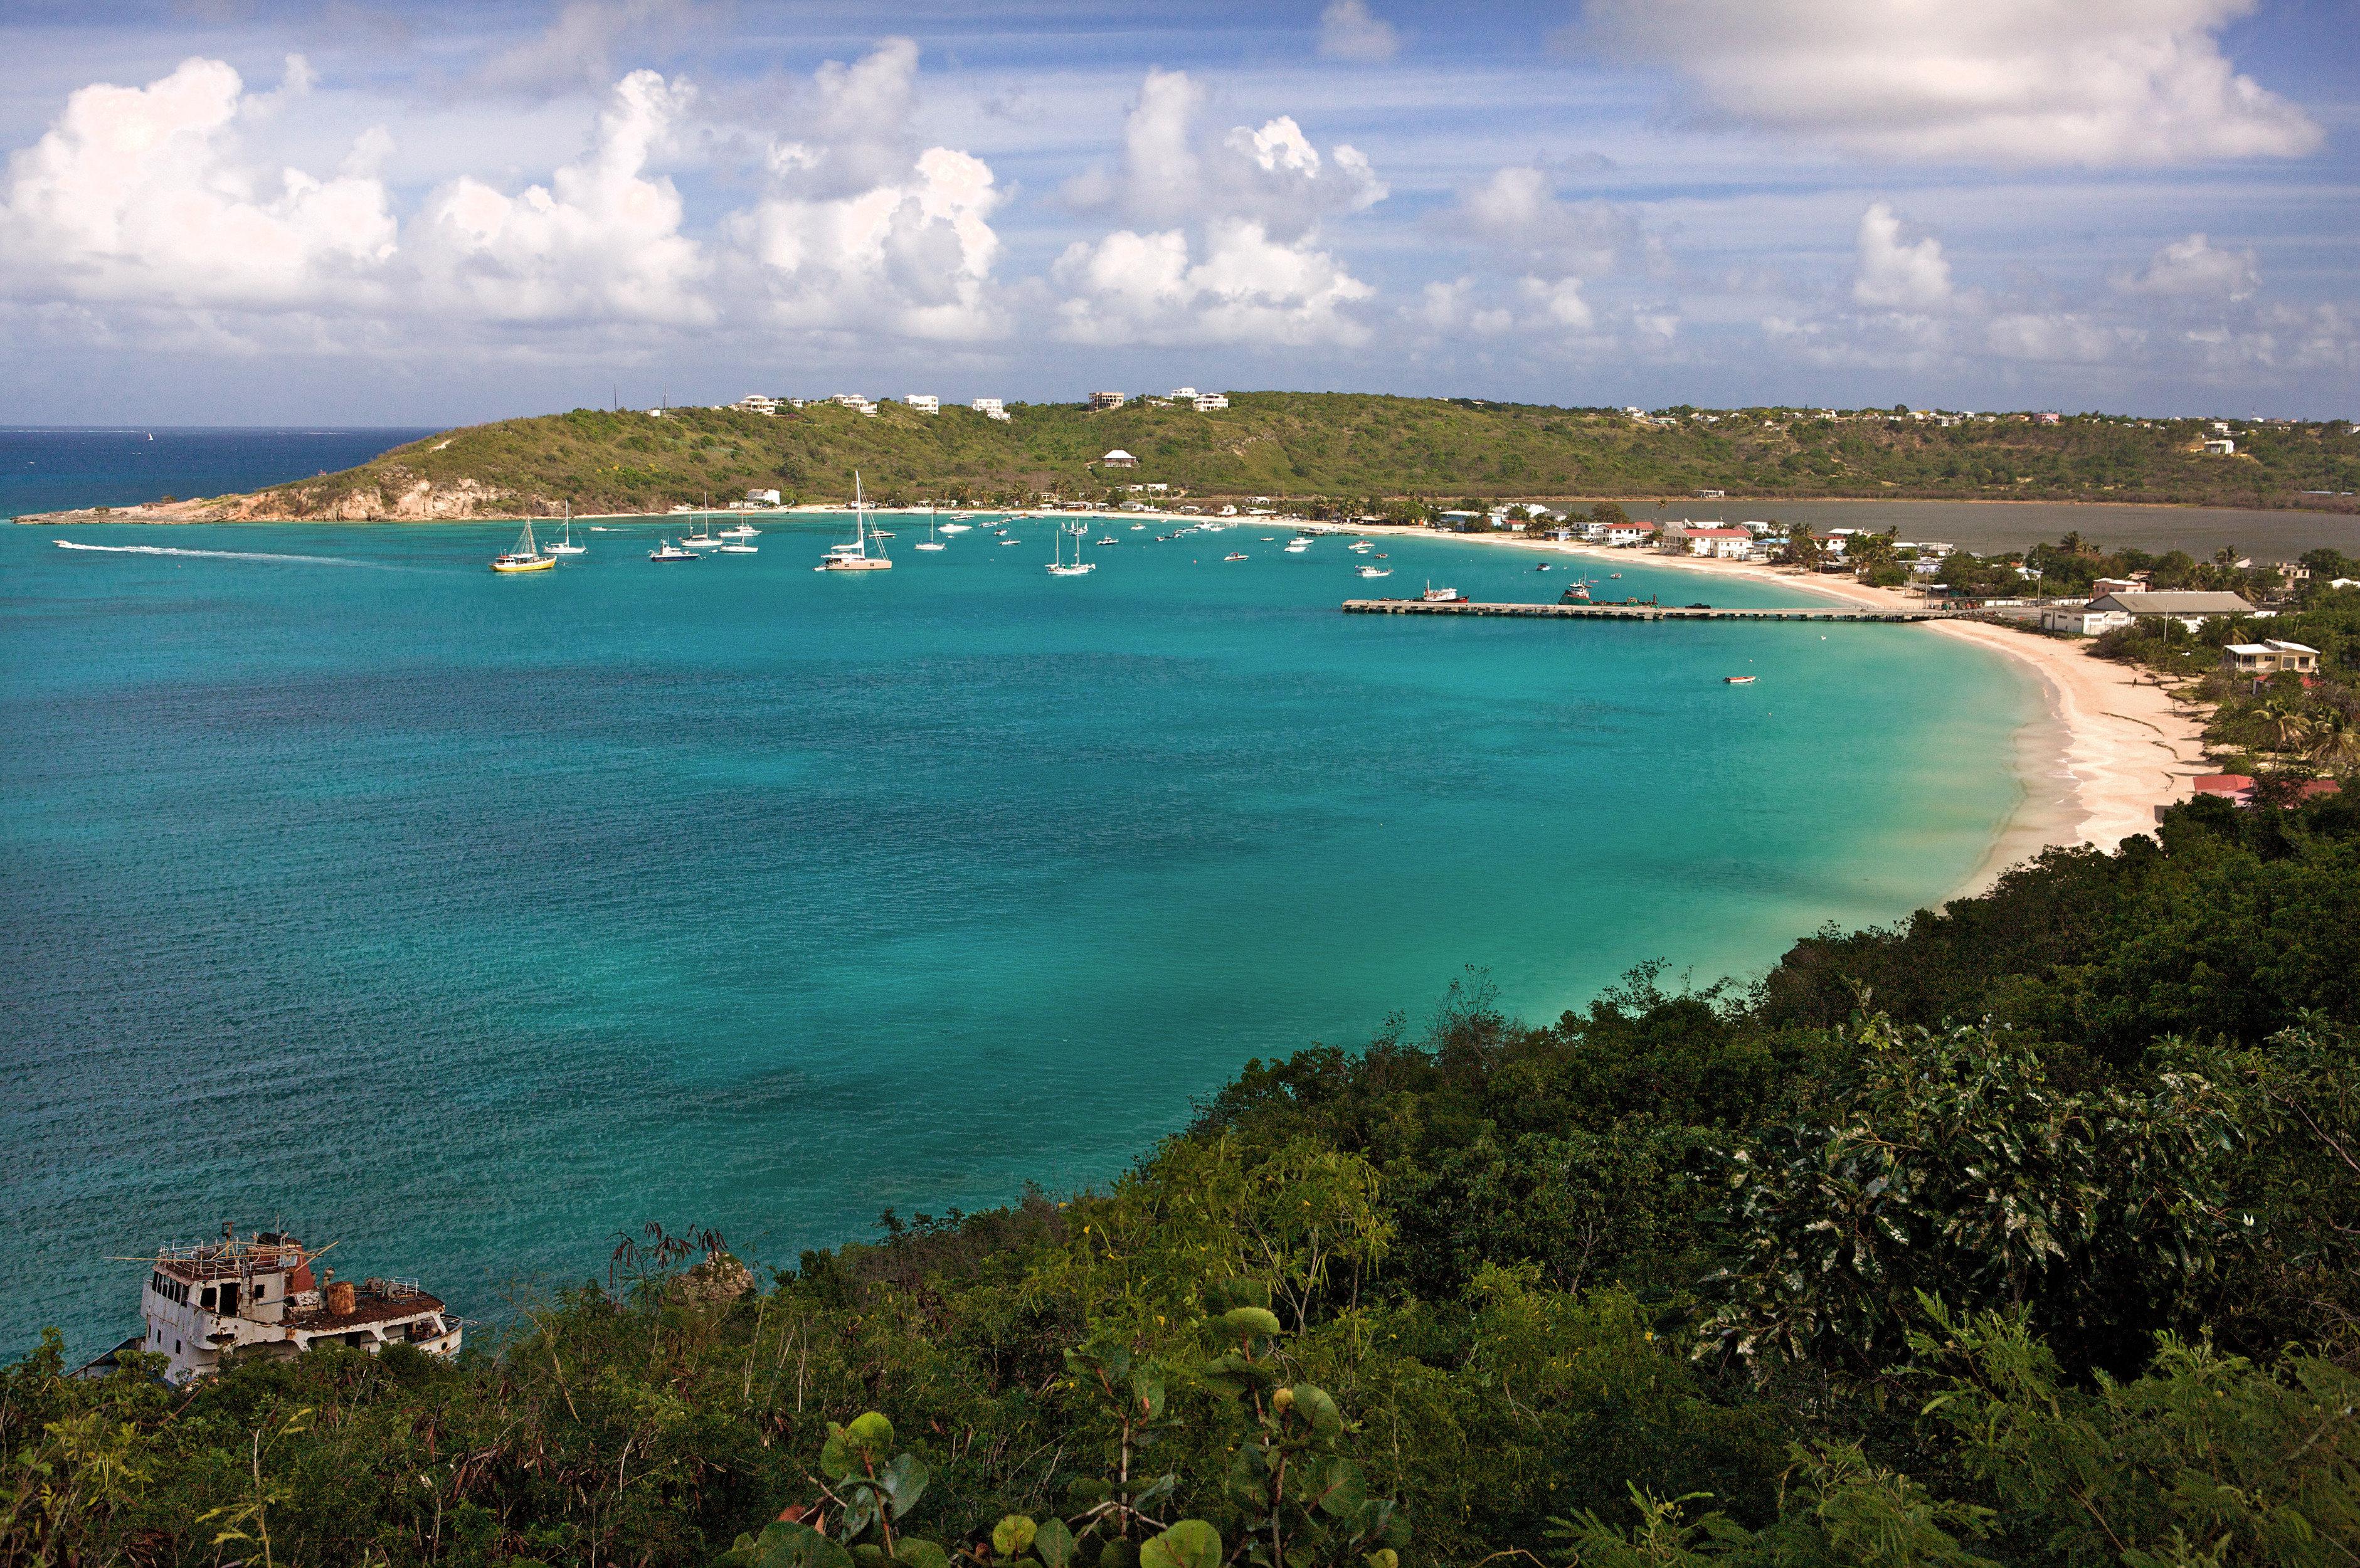 Beach Beachfront Grounds Ocean water sky Nature Sea Coast shore horizon reef islet cape cove Lagoon caribbean terrain archipelago Island cliff tropics promontory overlooking clouds day